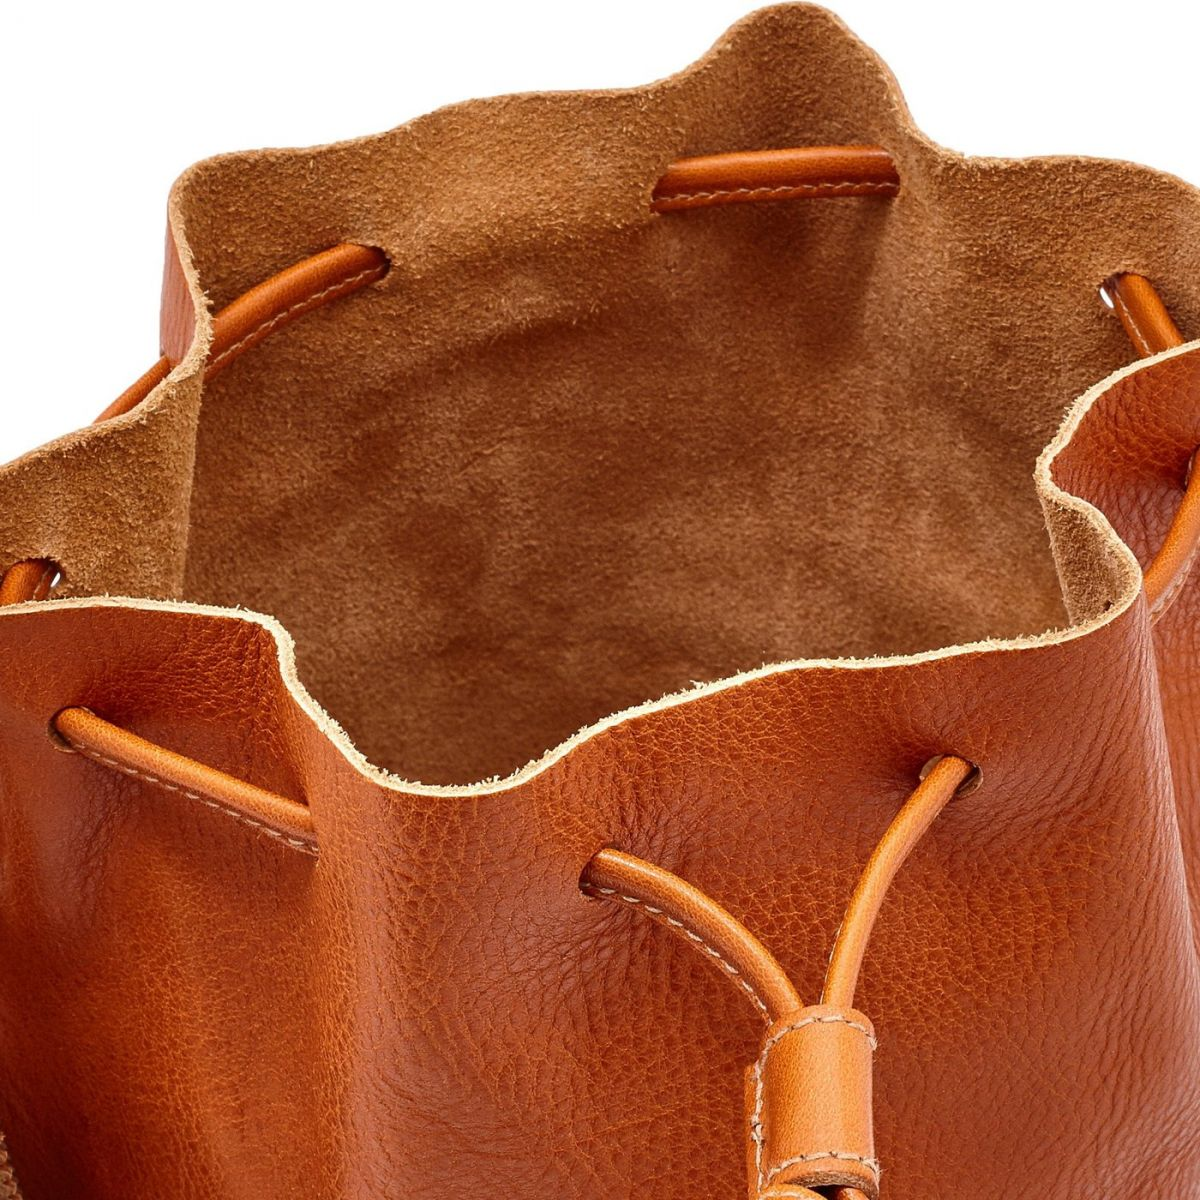 Women's Bucket Bag Stibbert in Cowhide Double Leather BBU006 color Caramel | Details